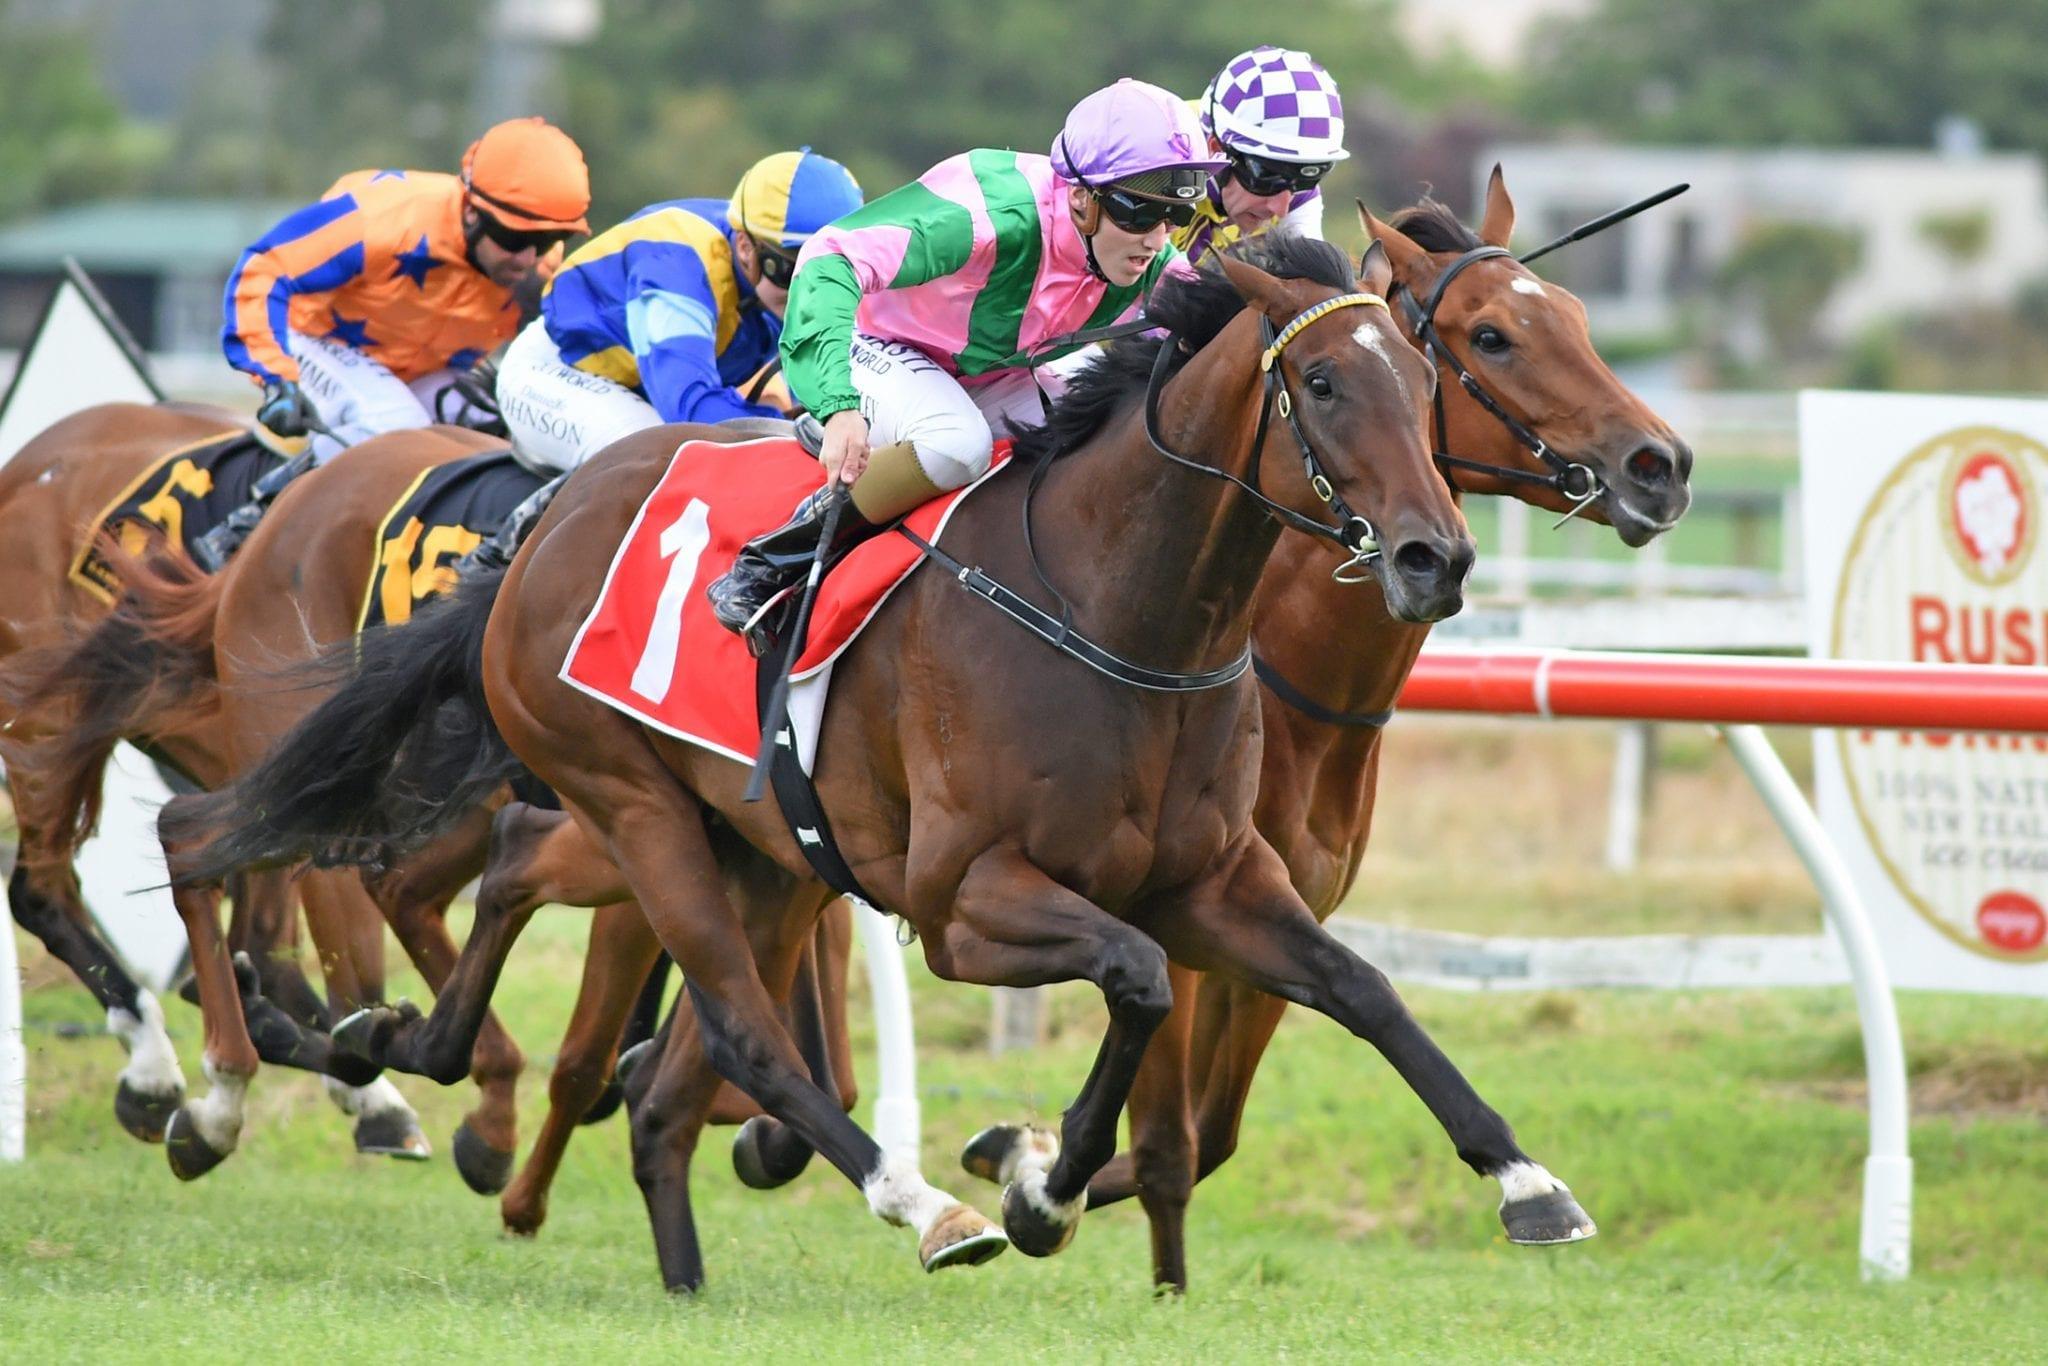 Aero De Paris winning at Hawkes Bay